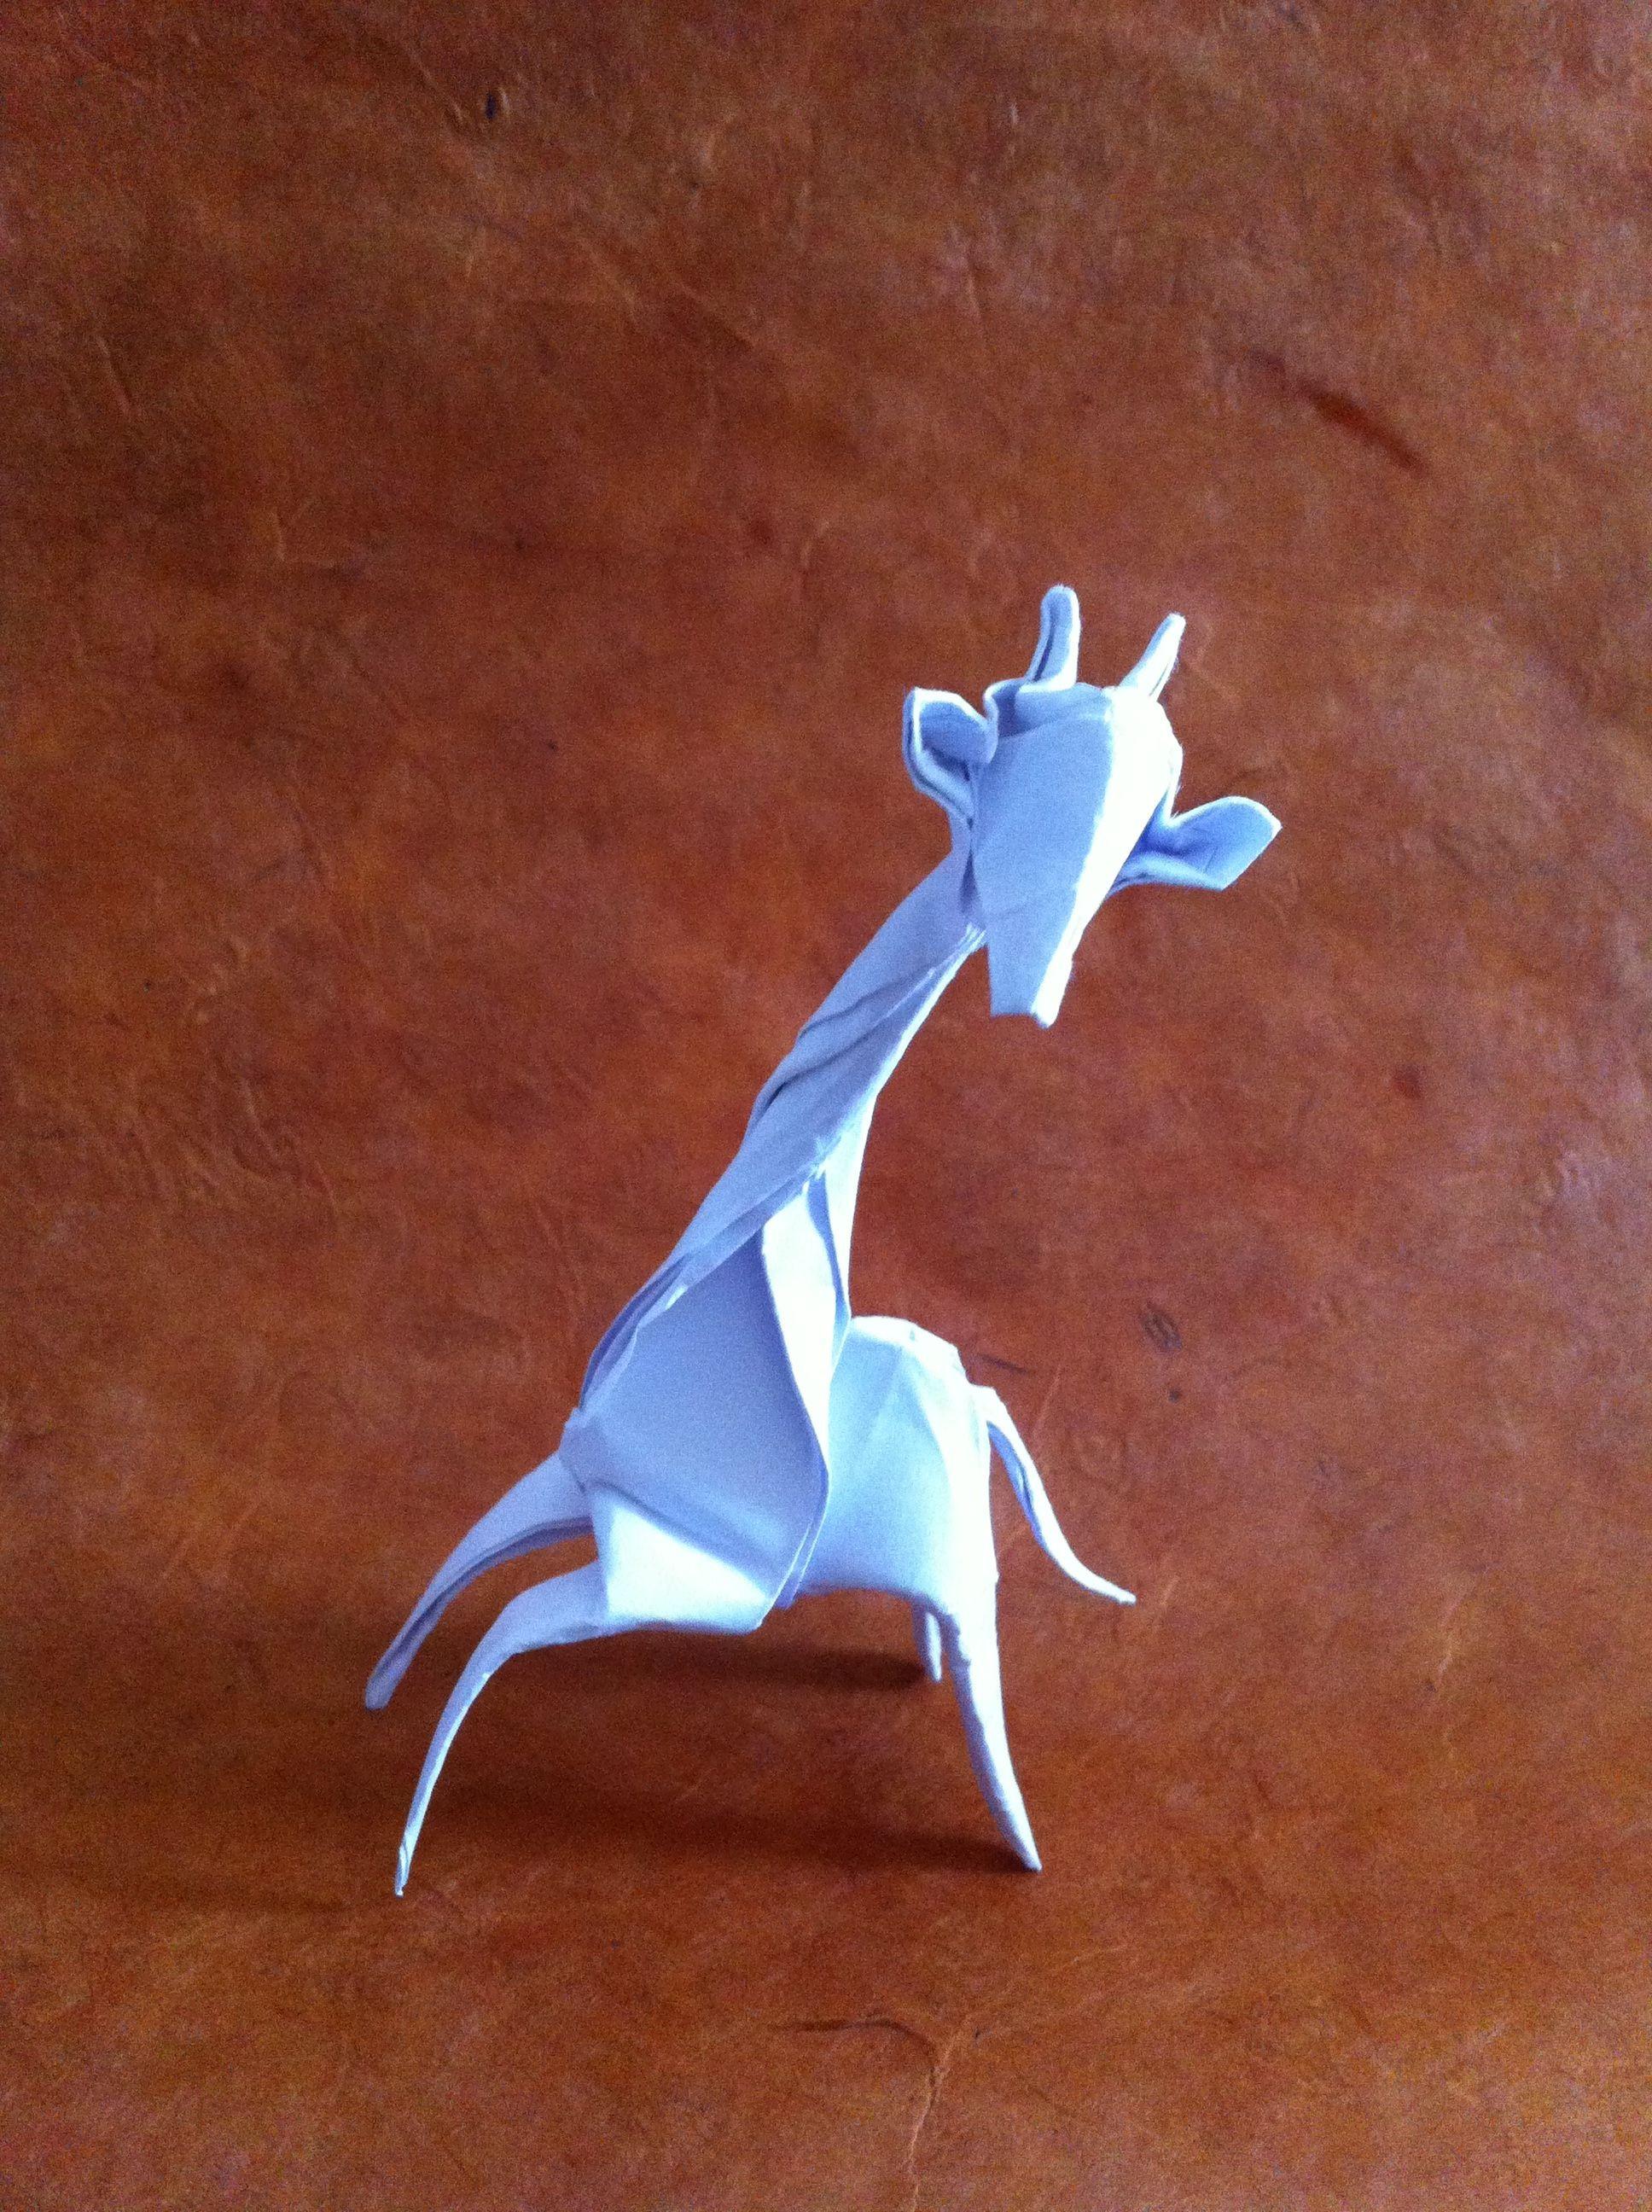 Printable Giraffe Papercraft - Printable Papercrafts ... - photo#29